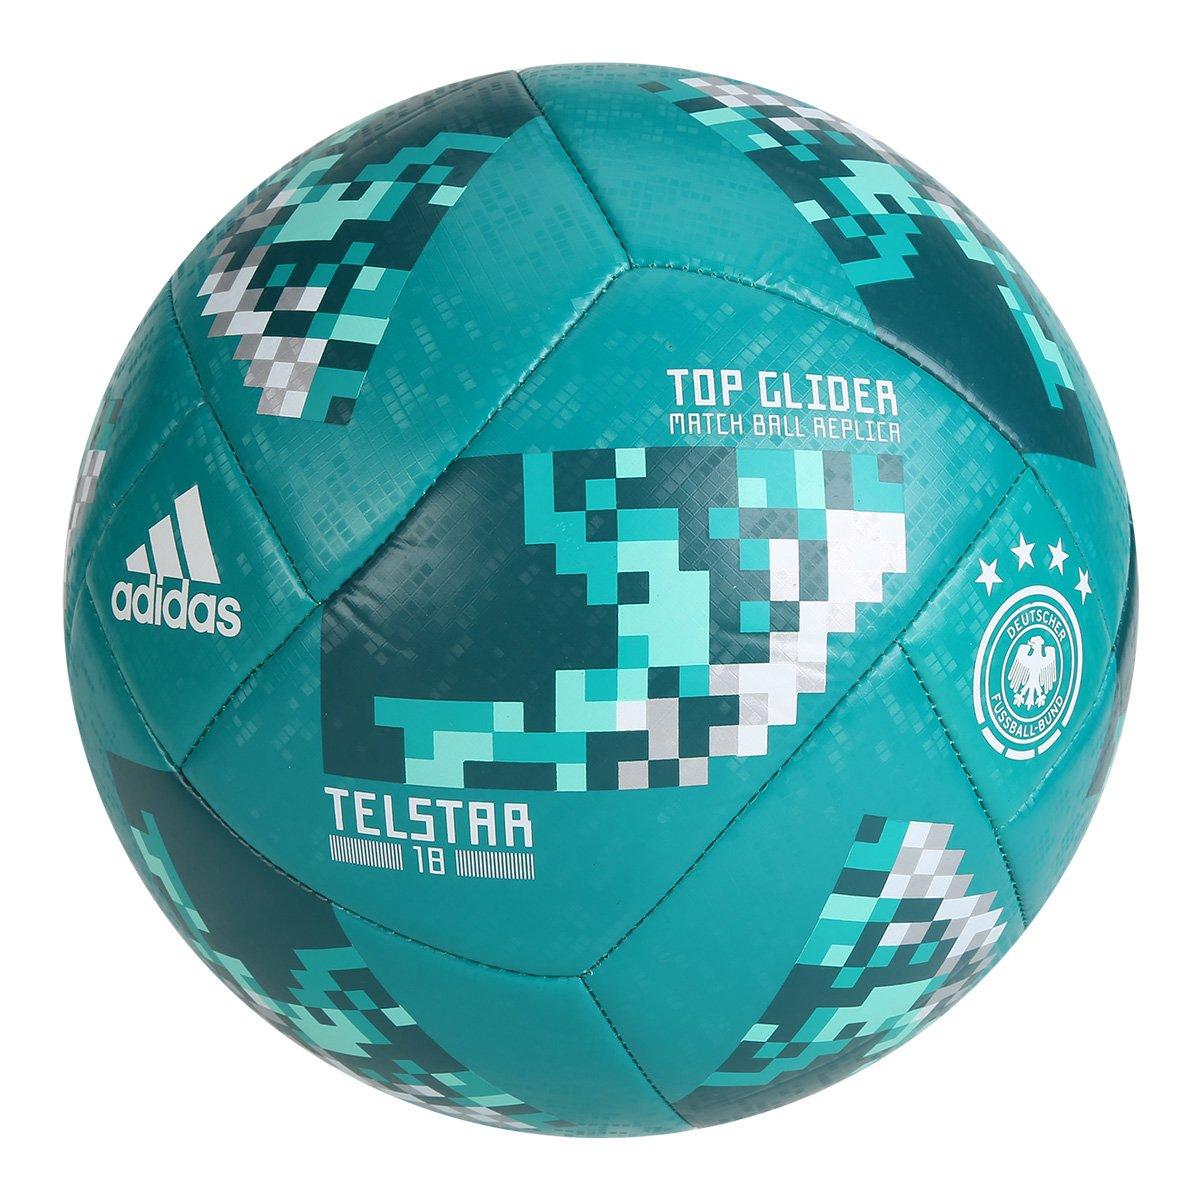 Bola Futebol Campo Adidas Alemanha TOP Glider Telstar 18 Copa do ... f9ed0f1409791